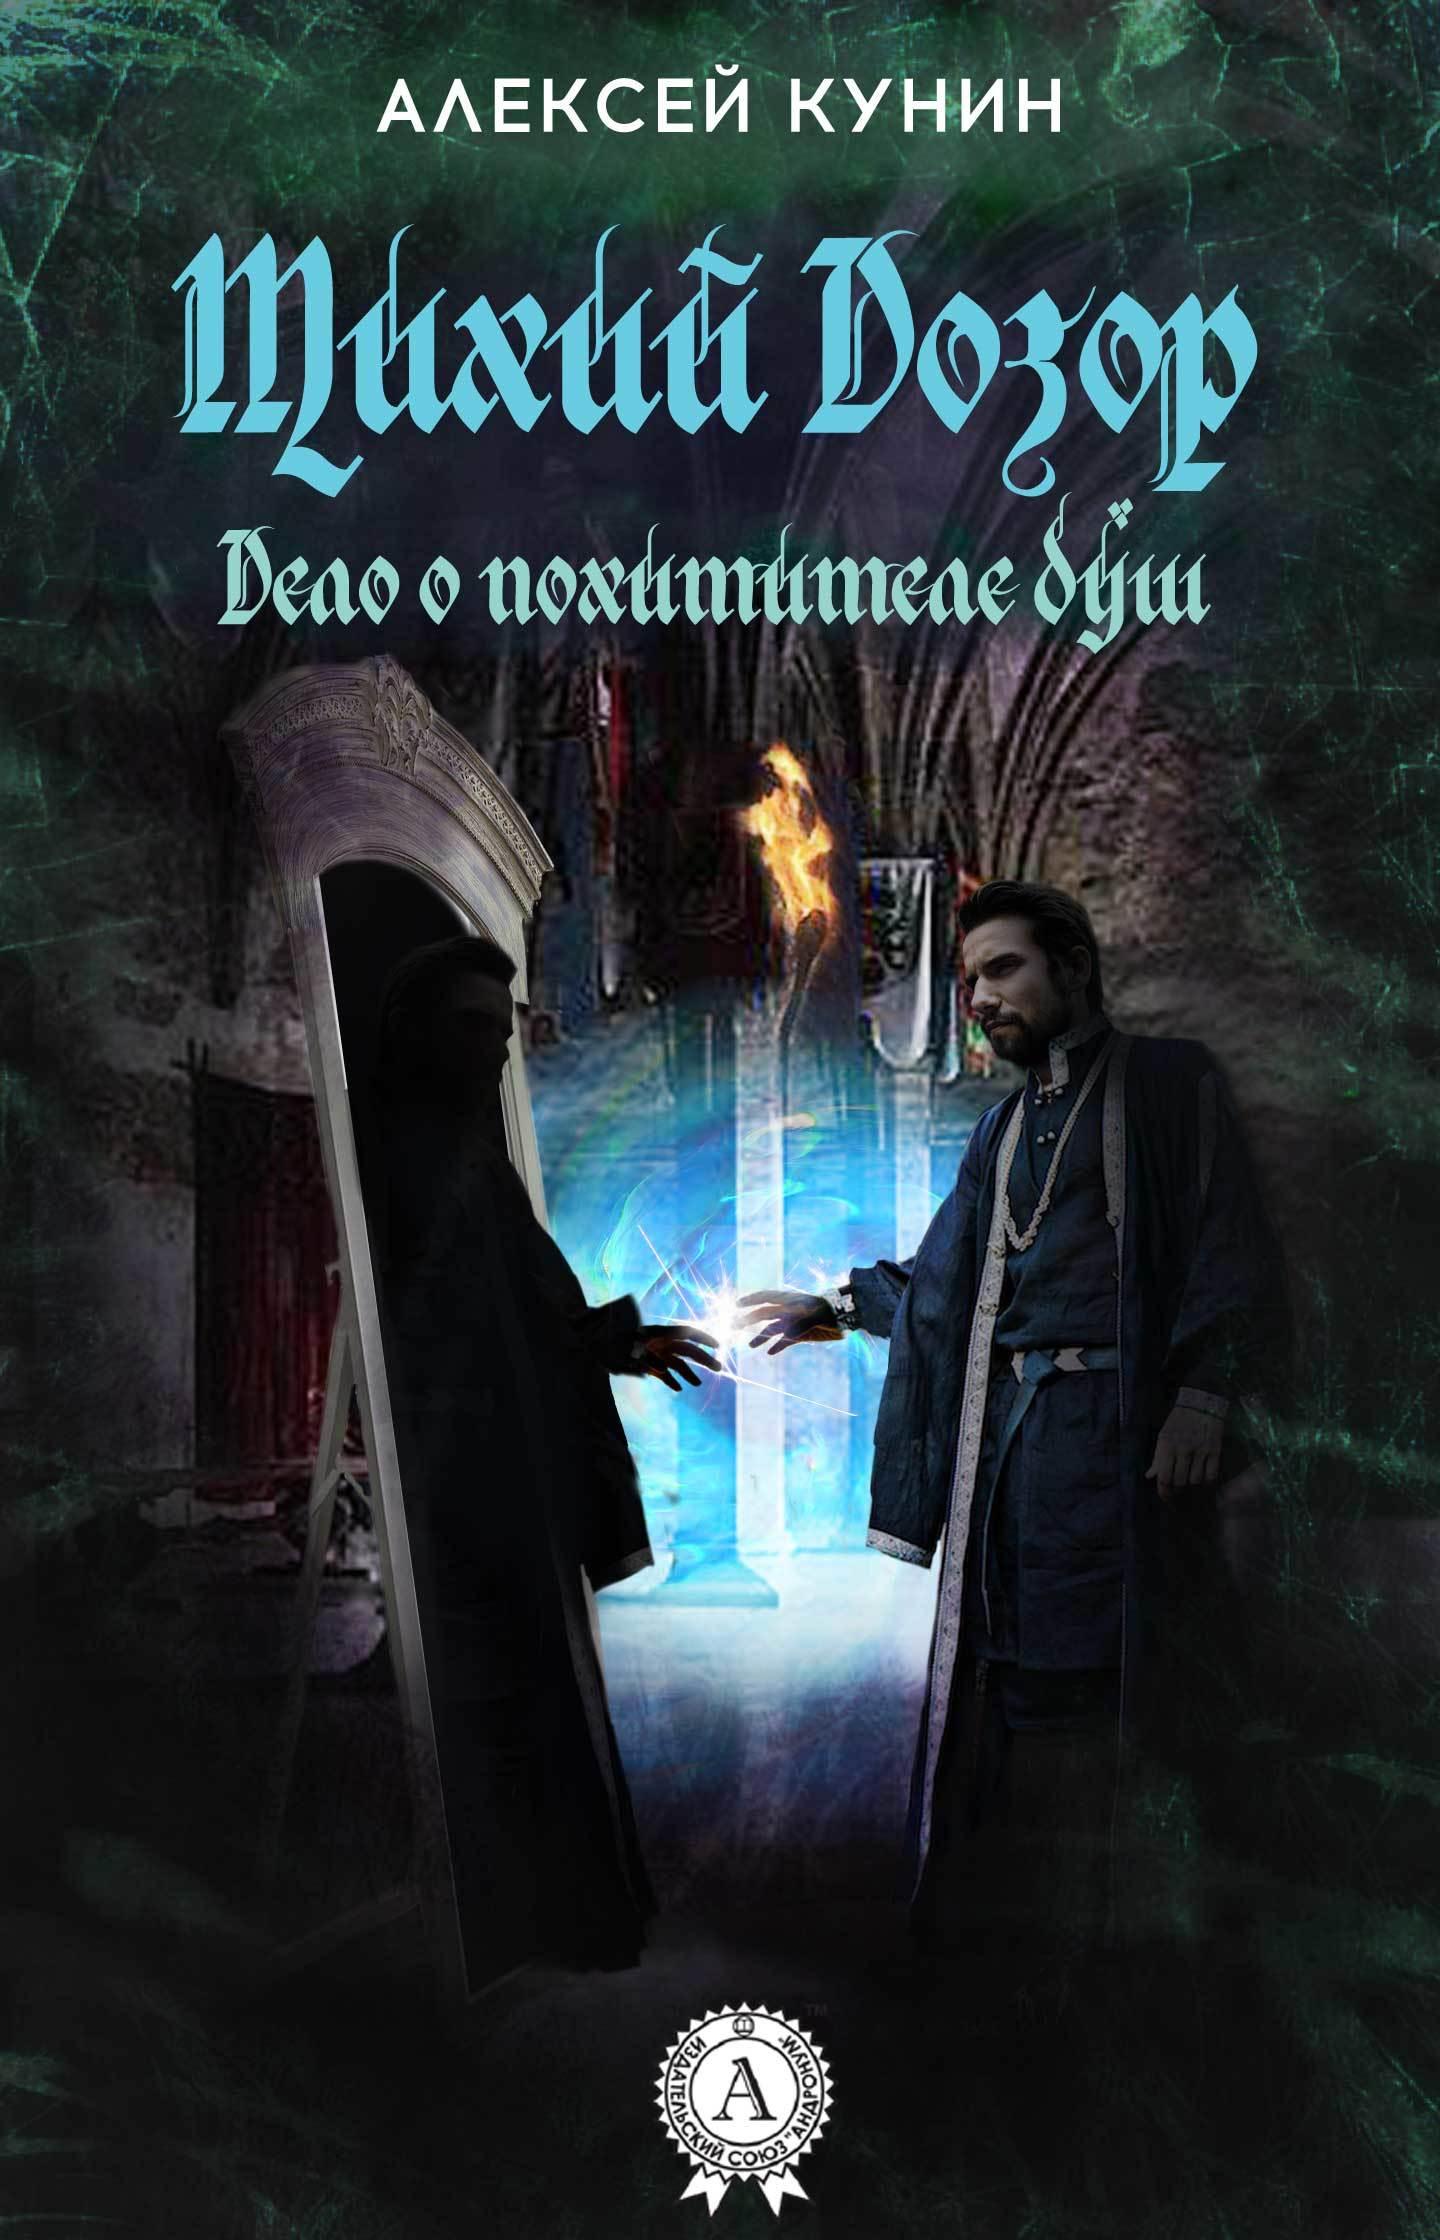 Алексей Кунин «Тихий Дозор»